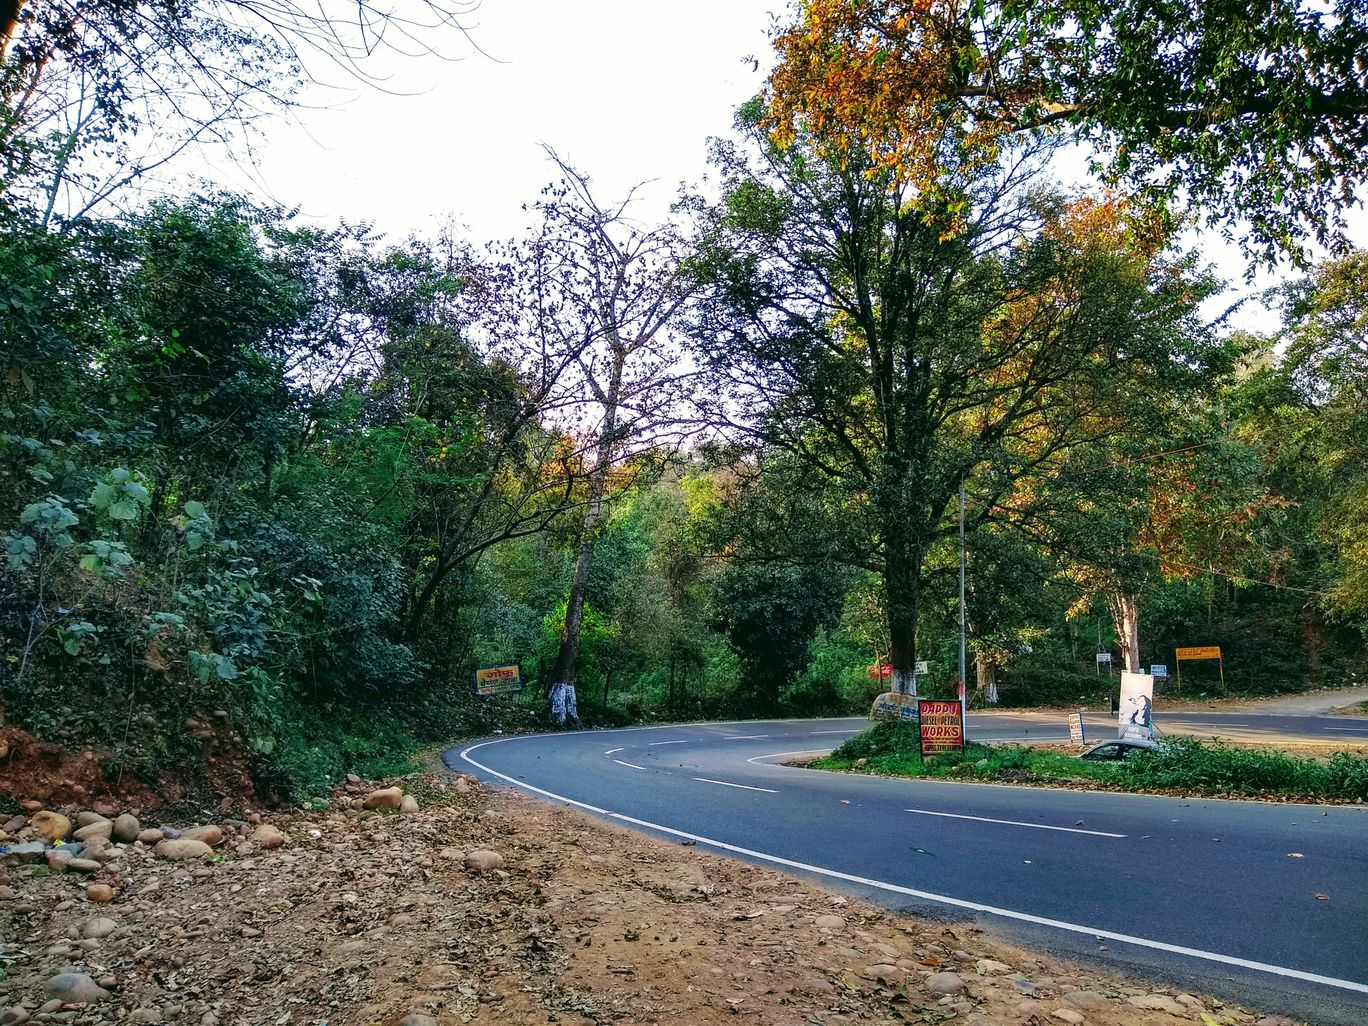 Photo of India By Debanjali Sajal